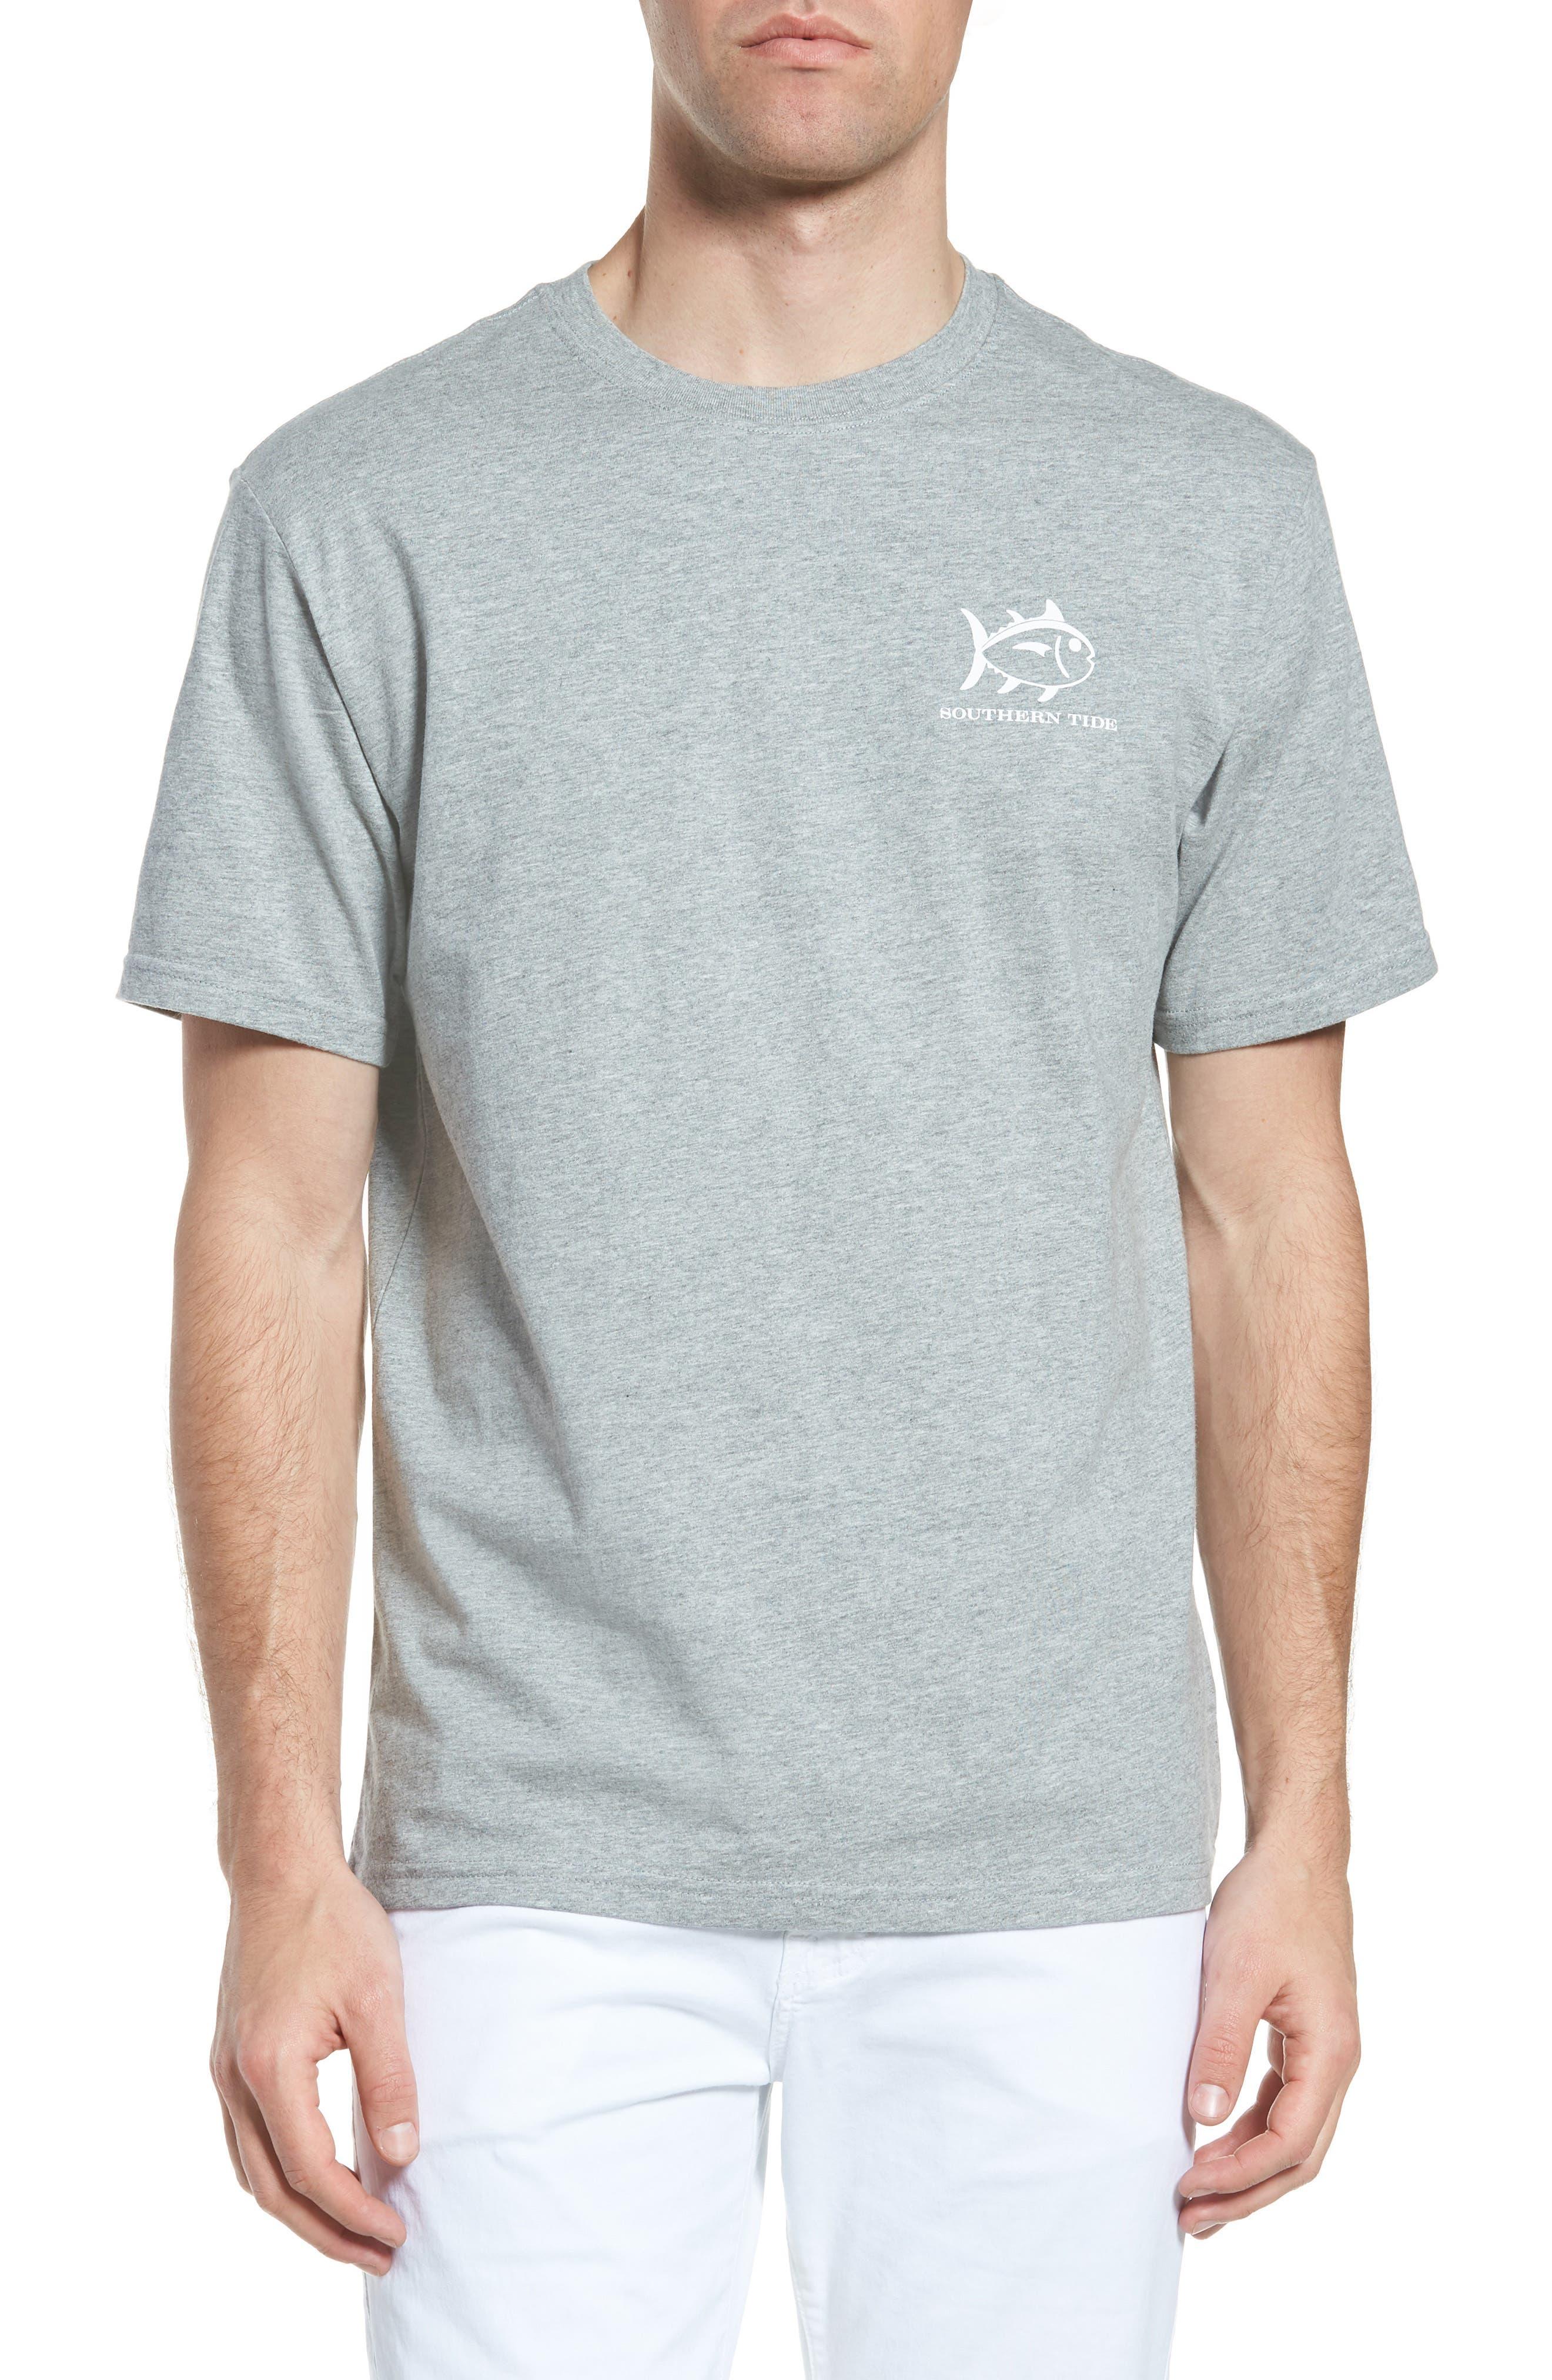 Southern Tide Reflection Crewneck T-Shirt